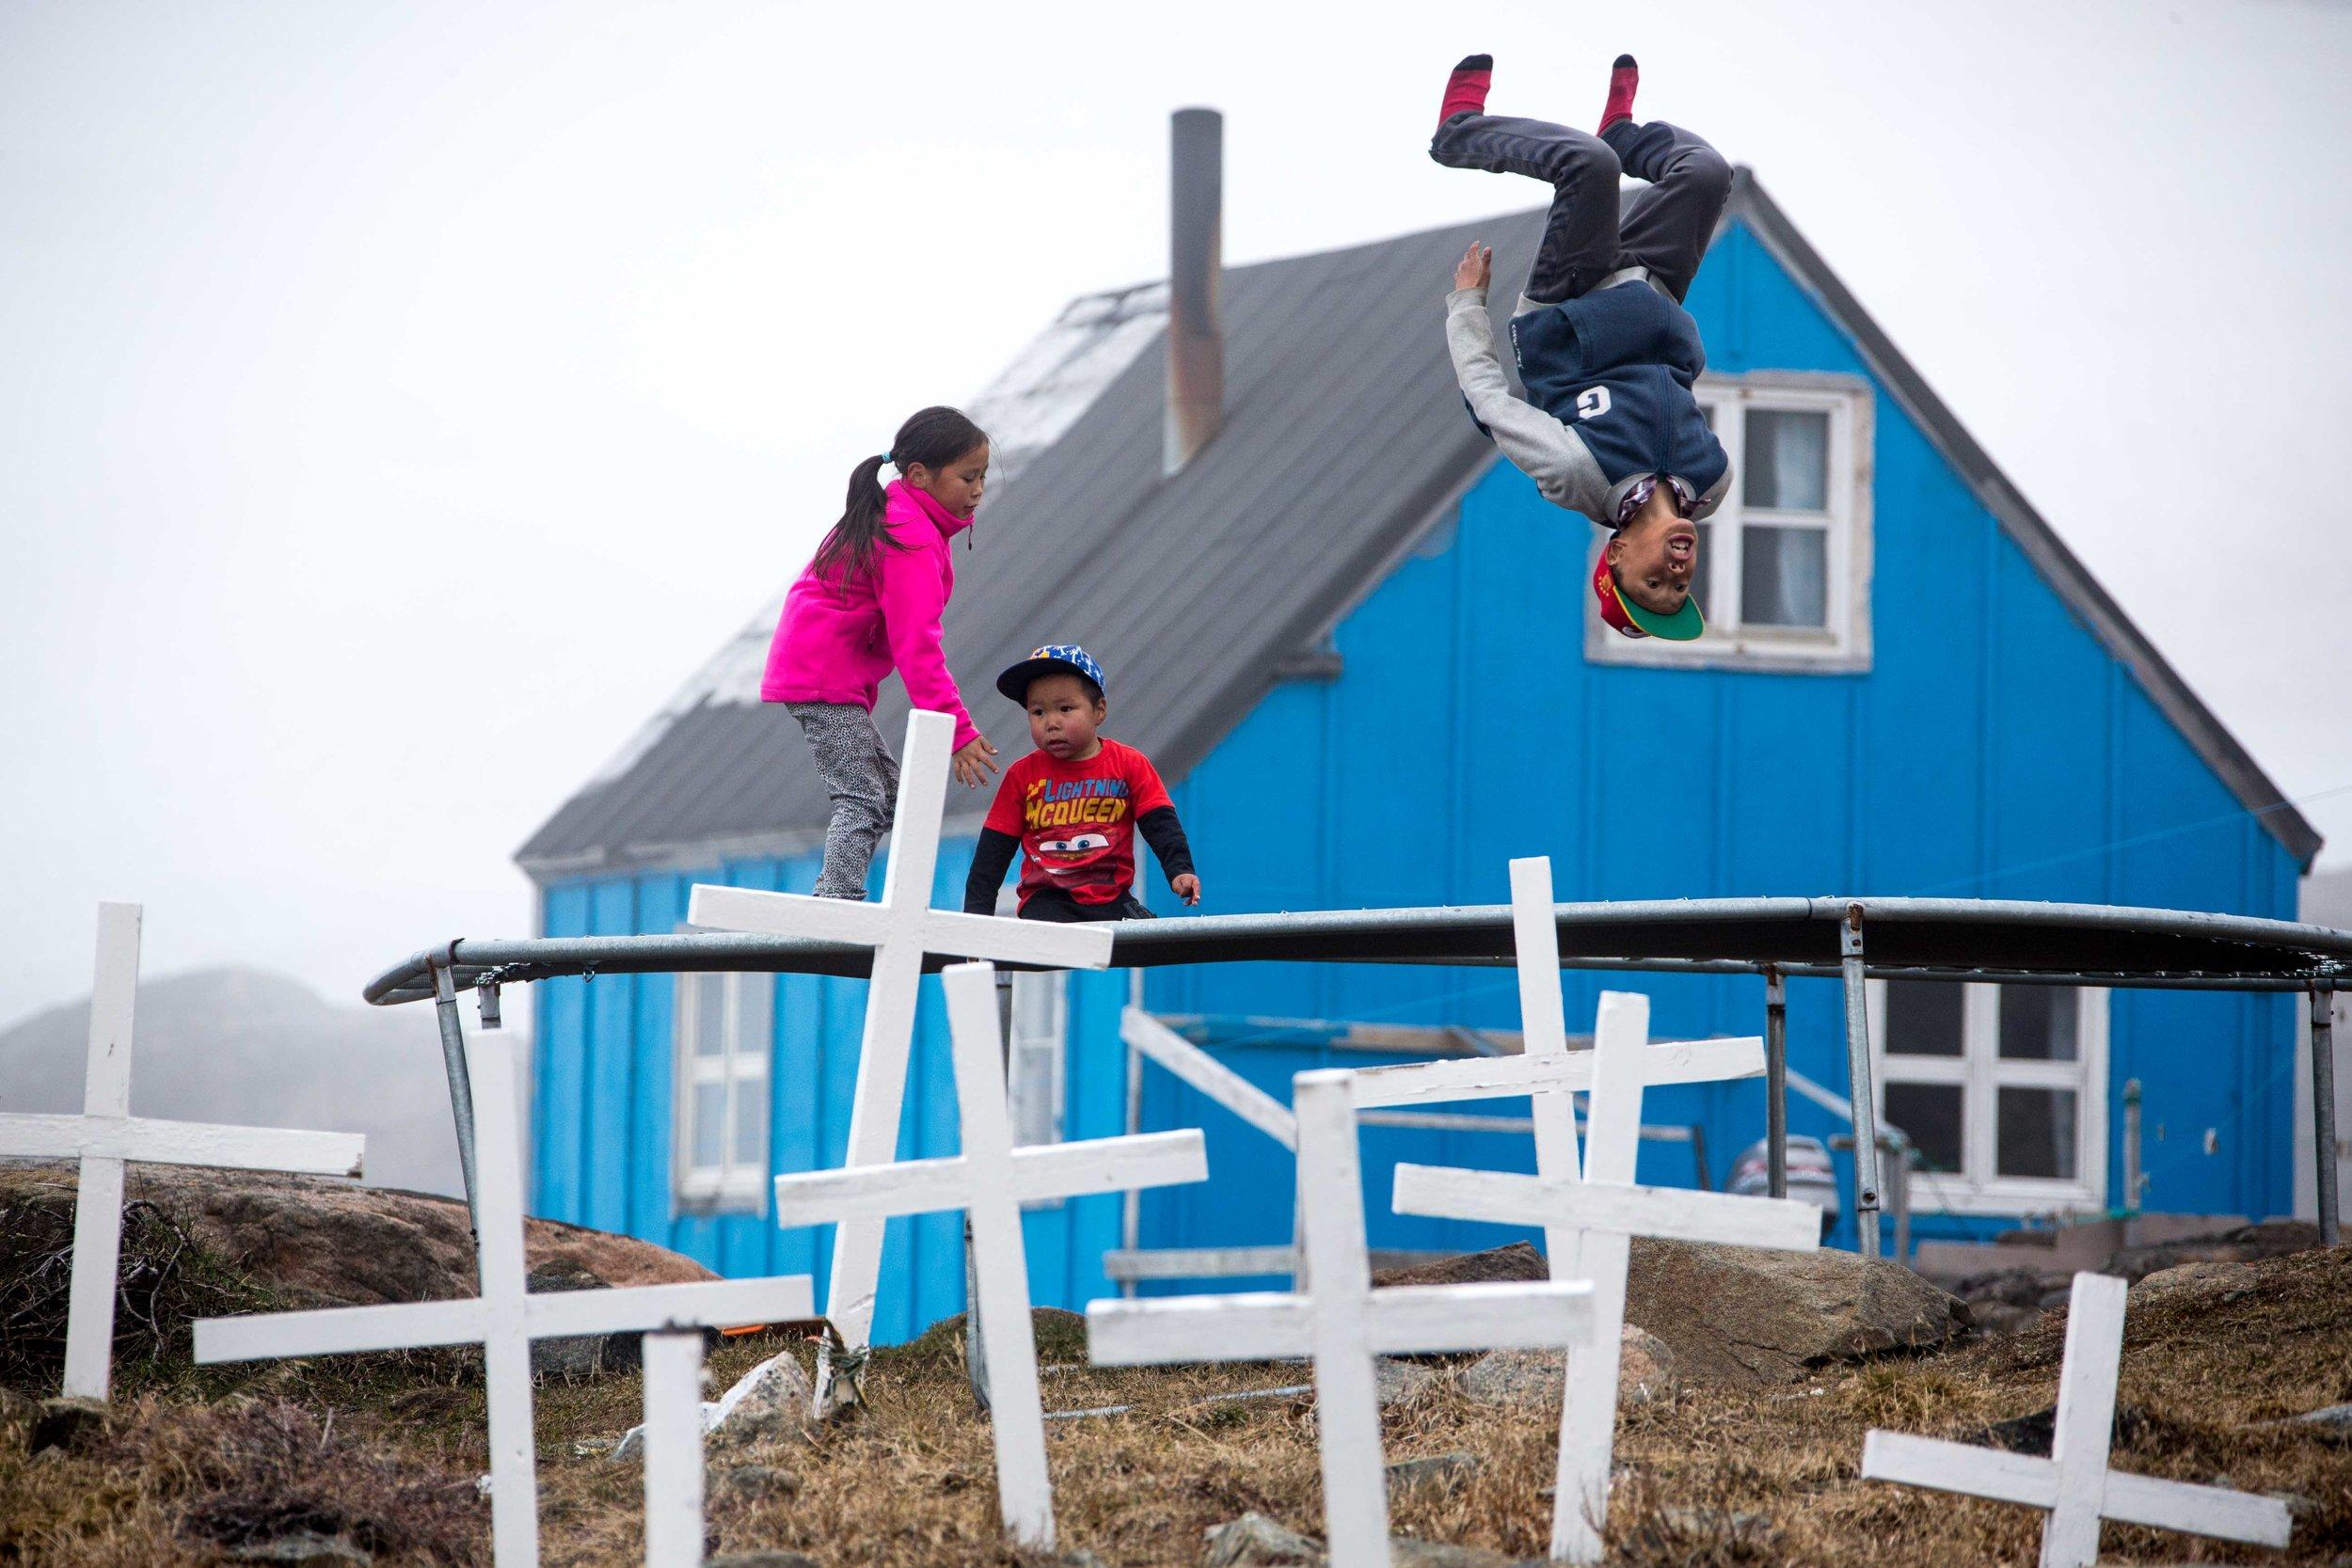 Kids take turns doing backflips on their trampoline next to Kulusuk's cemetary.